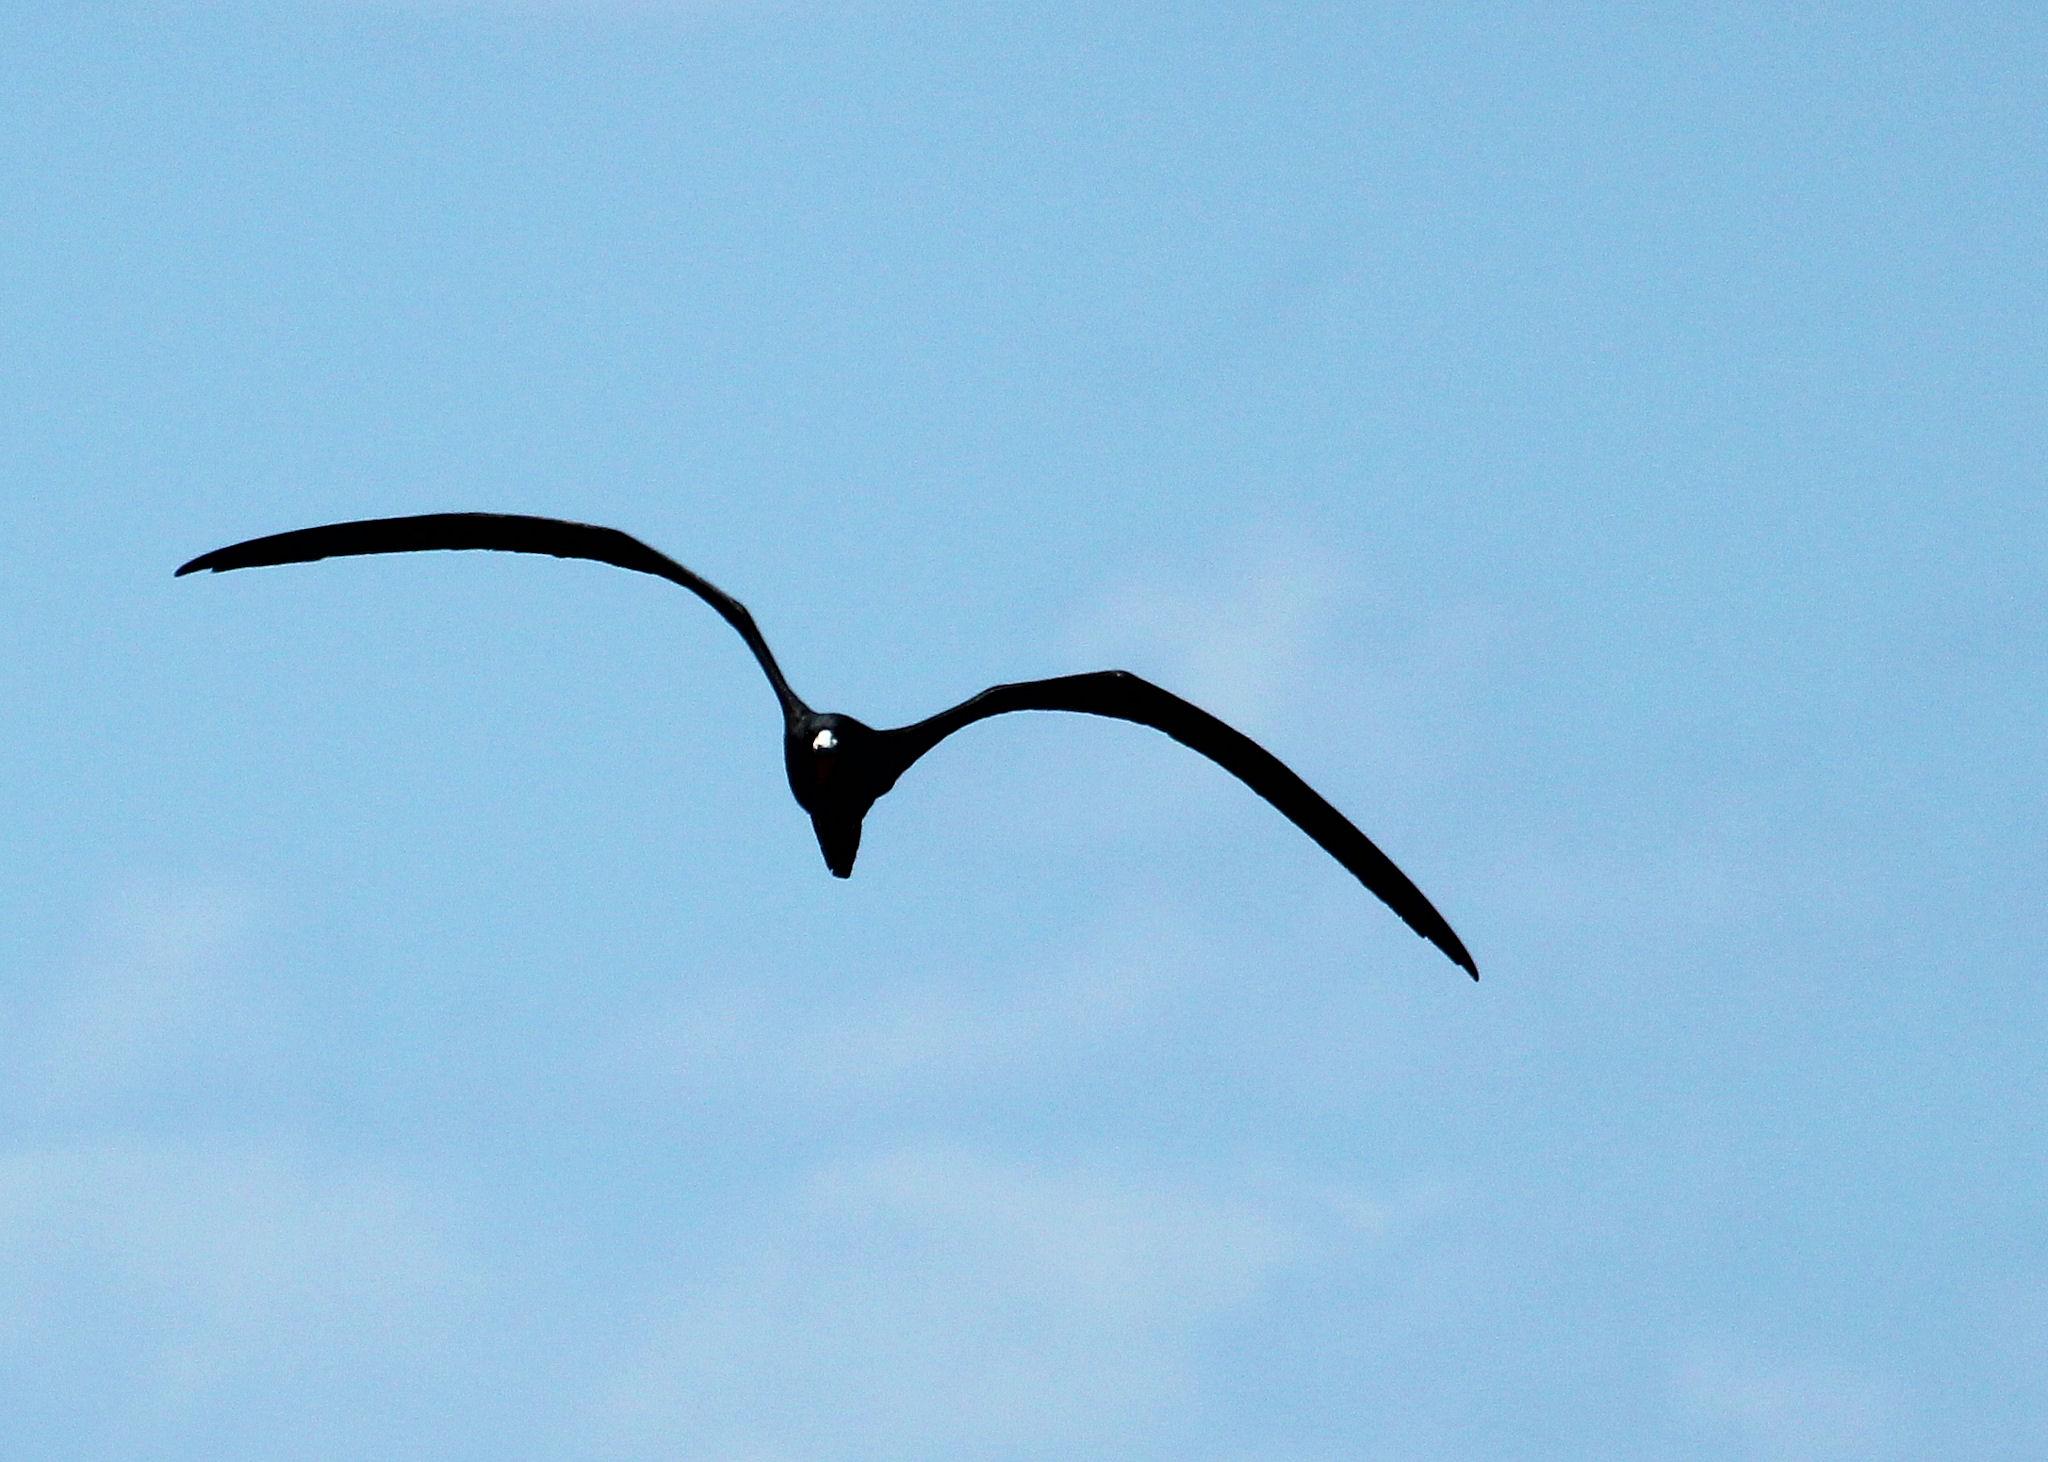 adult male magnificent frigatebird approaching 02 - Dry Tortugas, FL - 2012-04-26